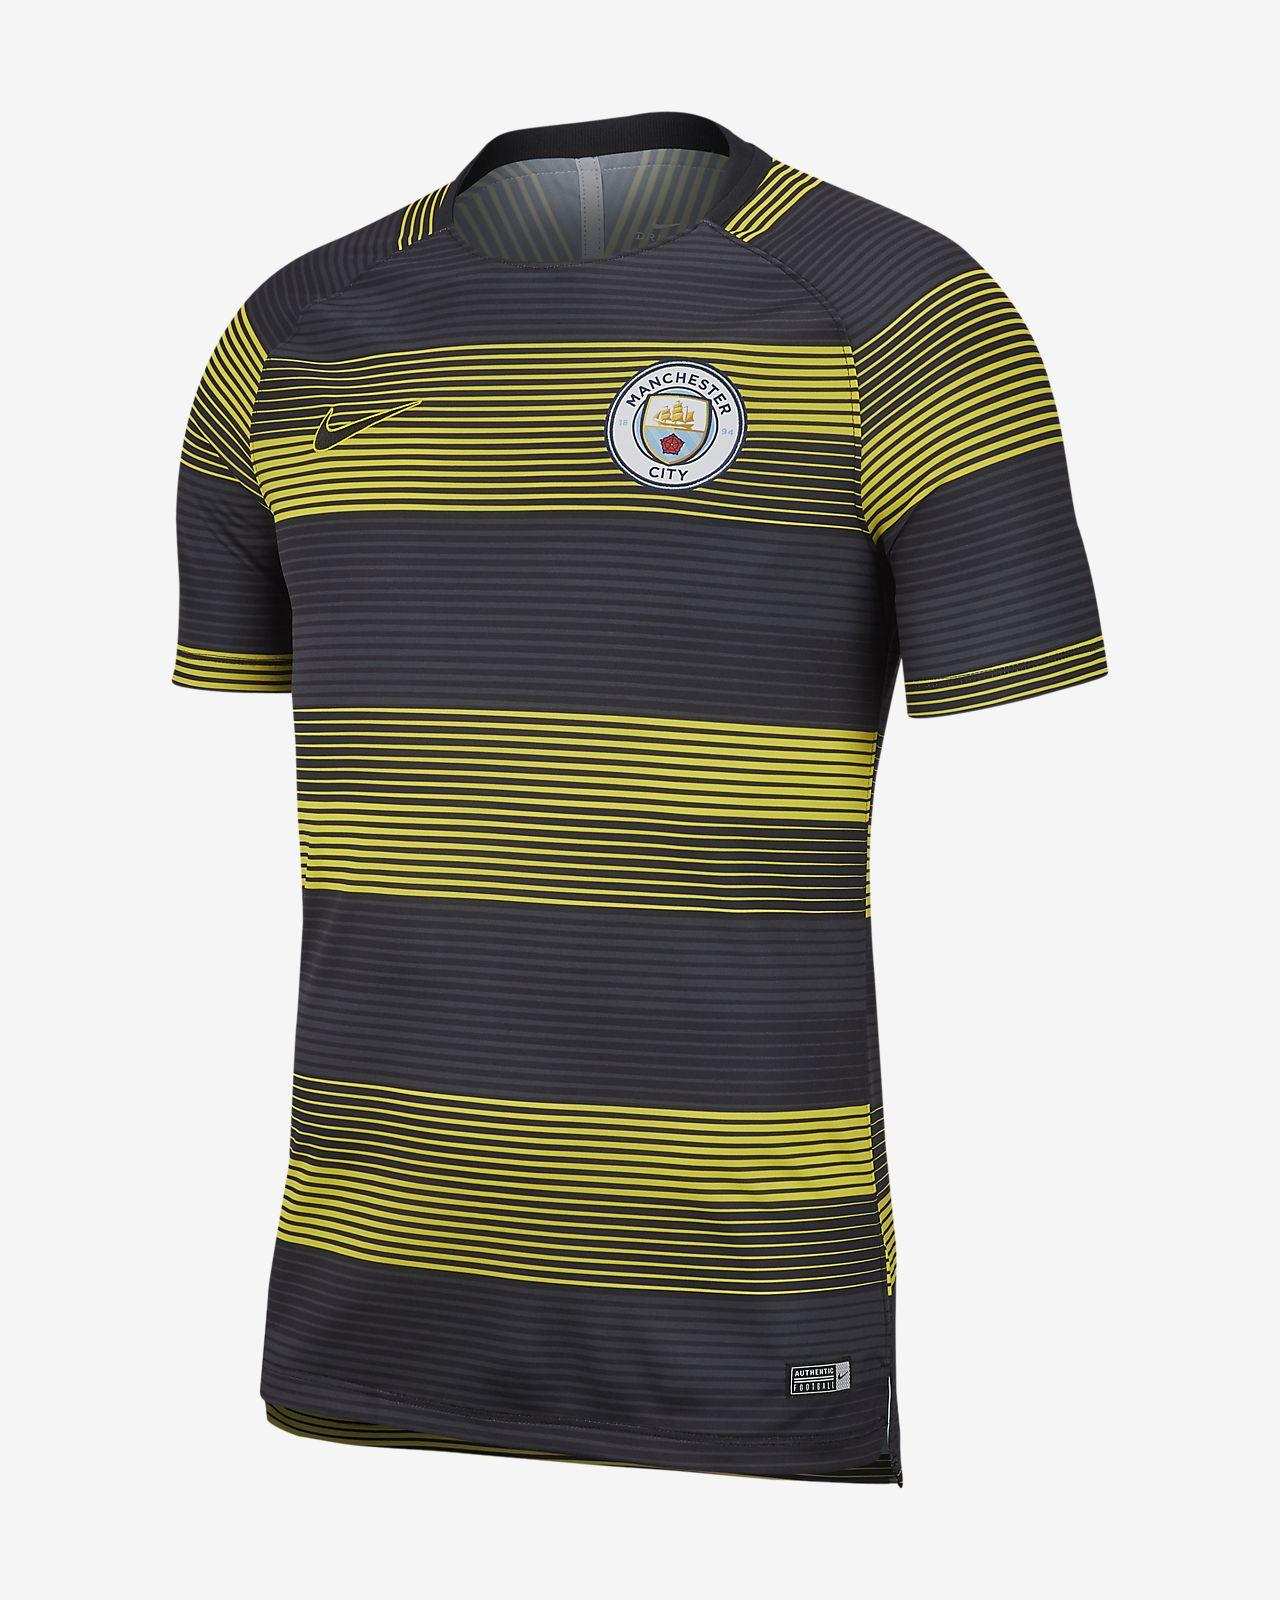 Con Fit Fútbol Dri Manchester Estampado Camiseta Hombre De Squad Manga City Corta Nike qpSzGLMVU